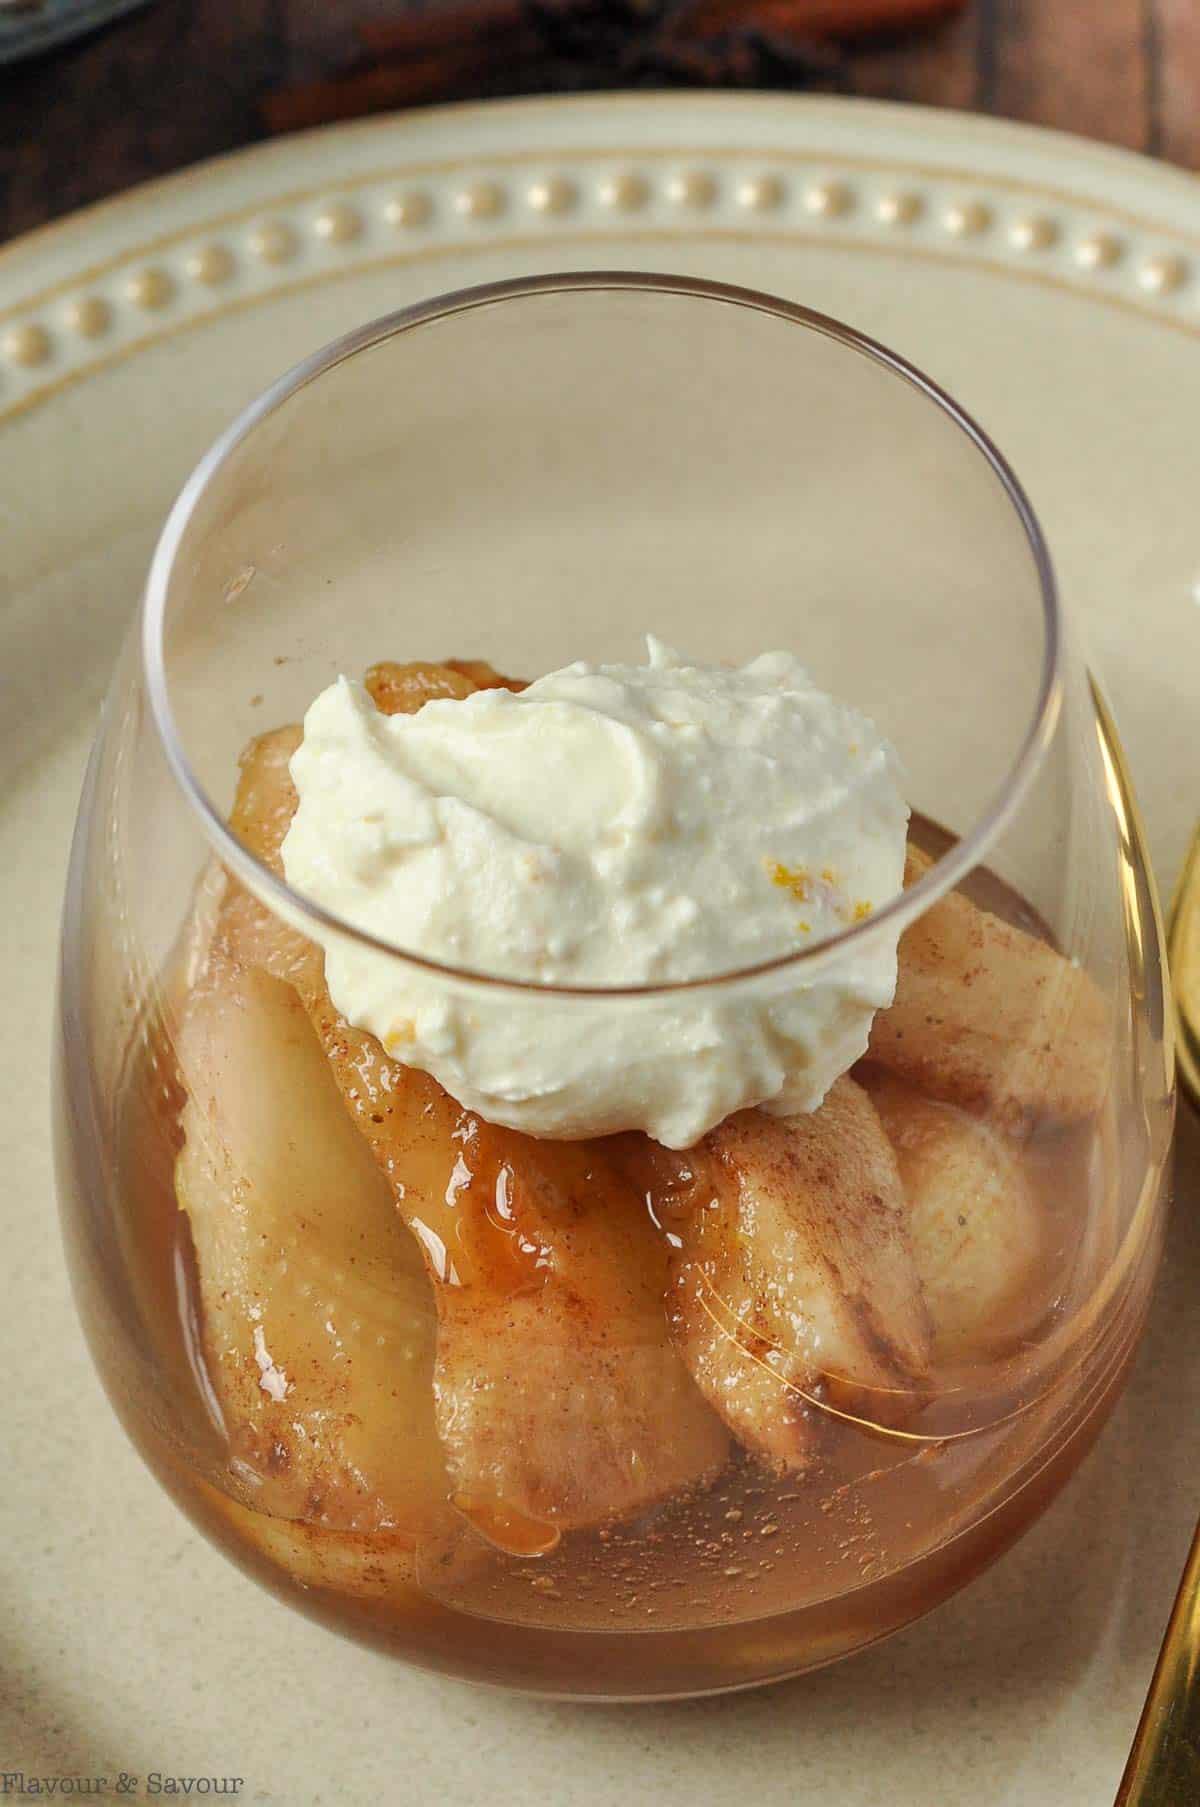 Poached cinnamon orange pears with mascarpone in a dessert glass.